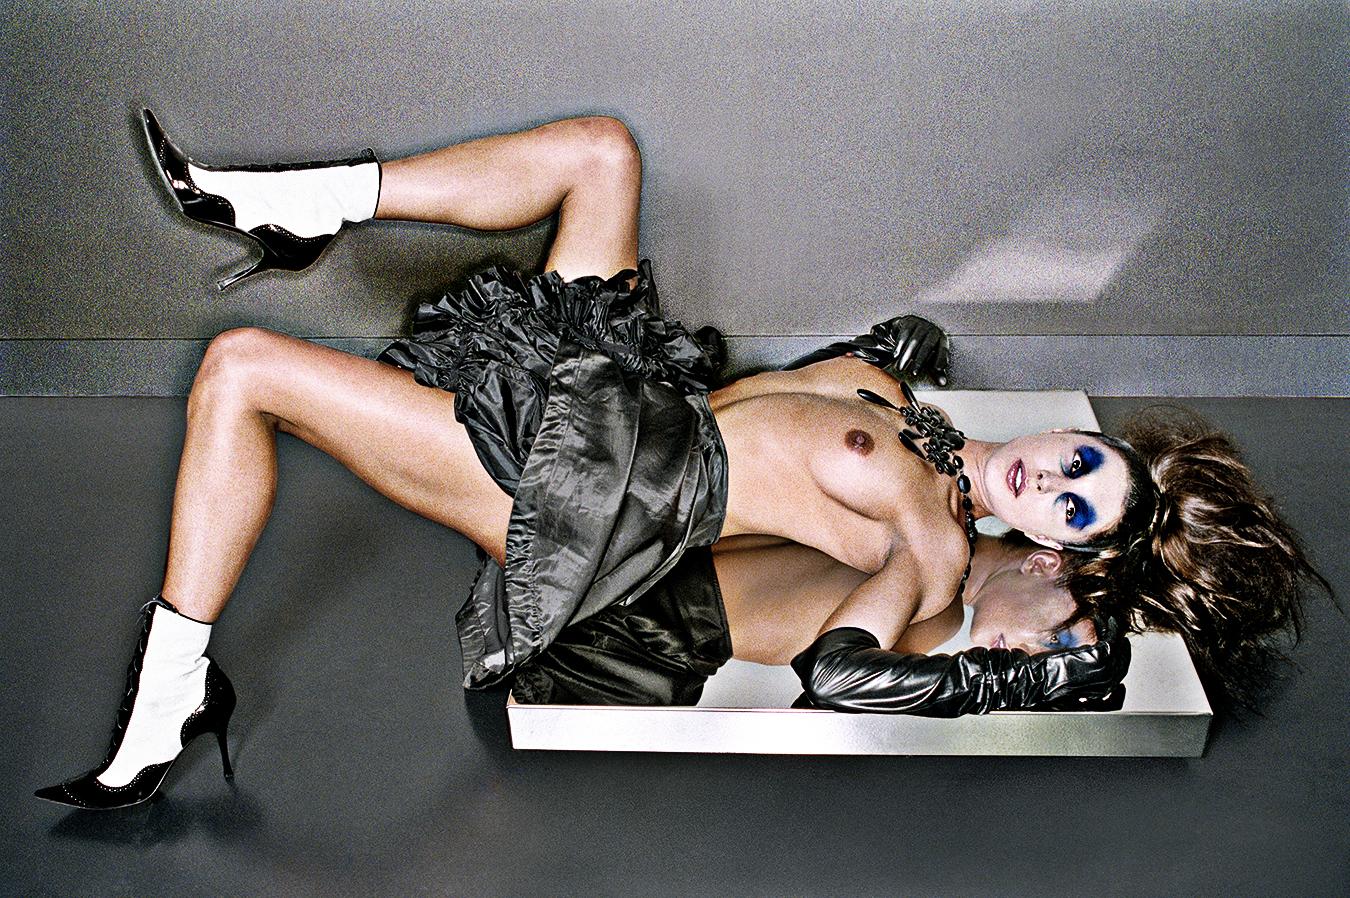 Tony_Ward_erotic_fetish_fashion_photoraphy_Blend_magazine_Amsterdam_bondage_art_shirburu_body_airbrush_painting_boots_topless_asian_women